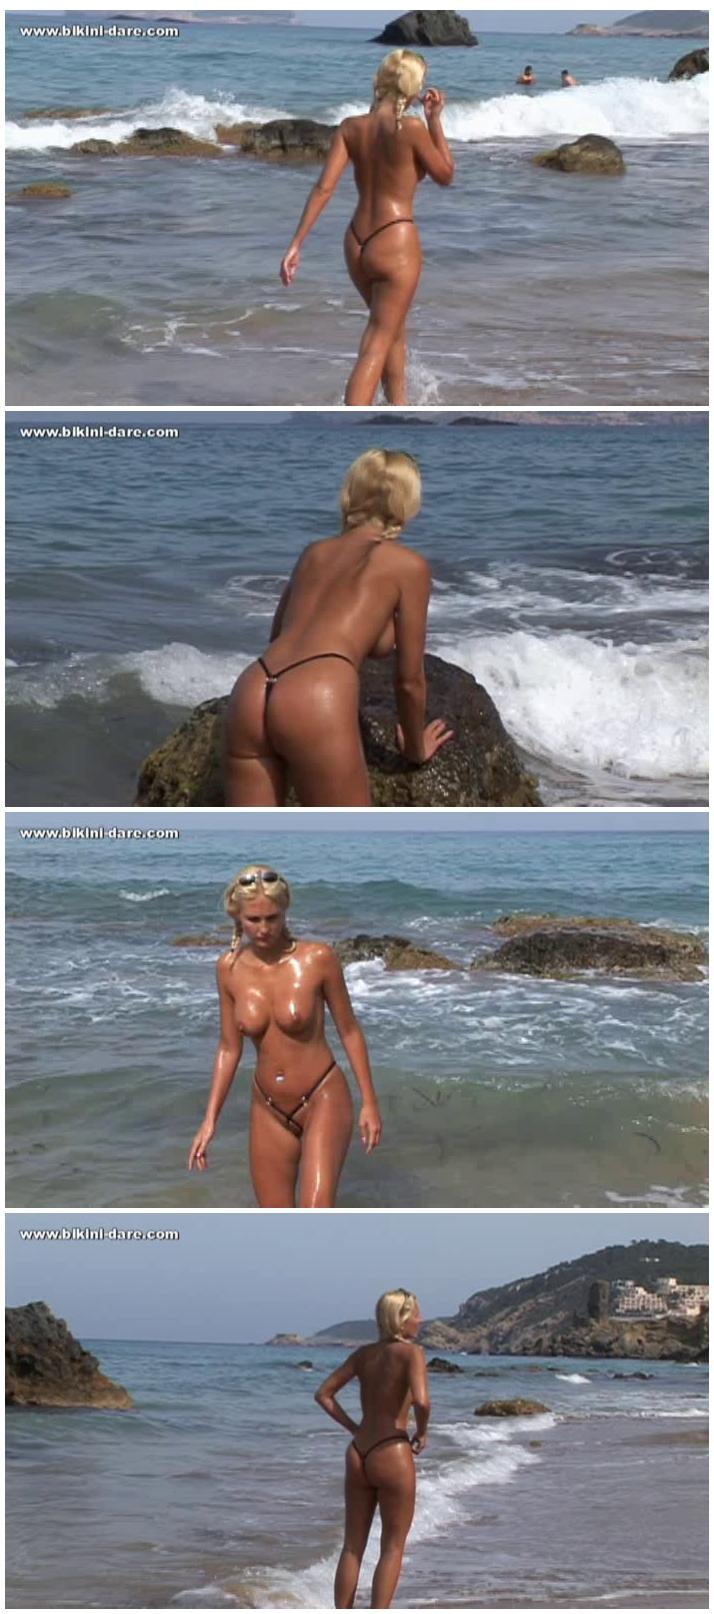 bikini-dare057_cover.jpg